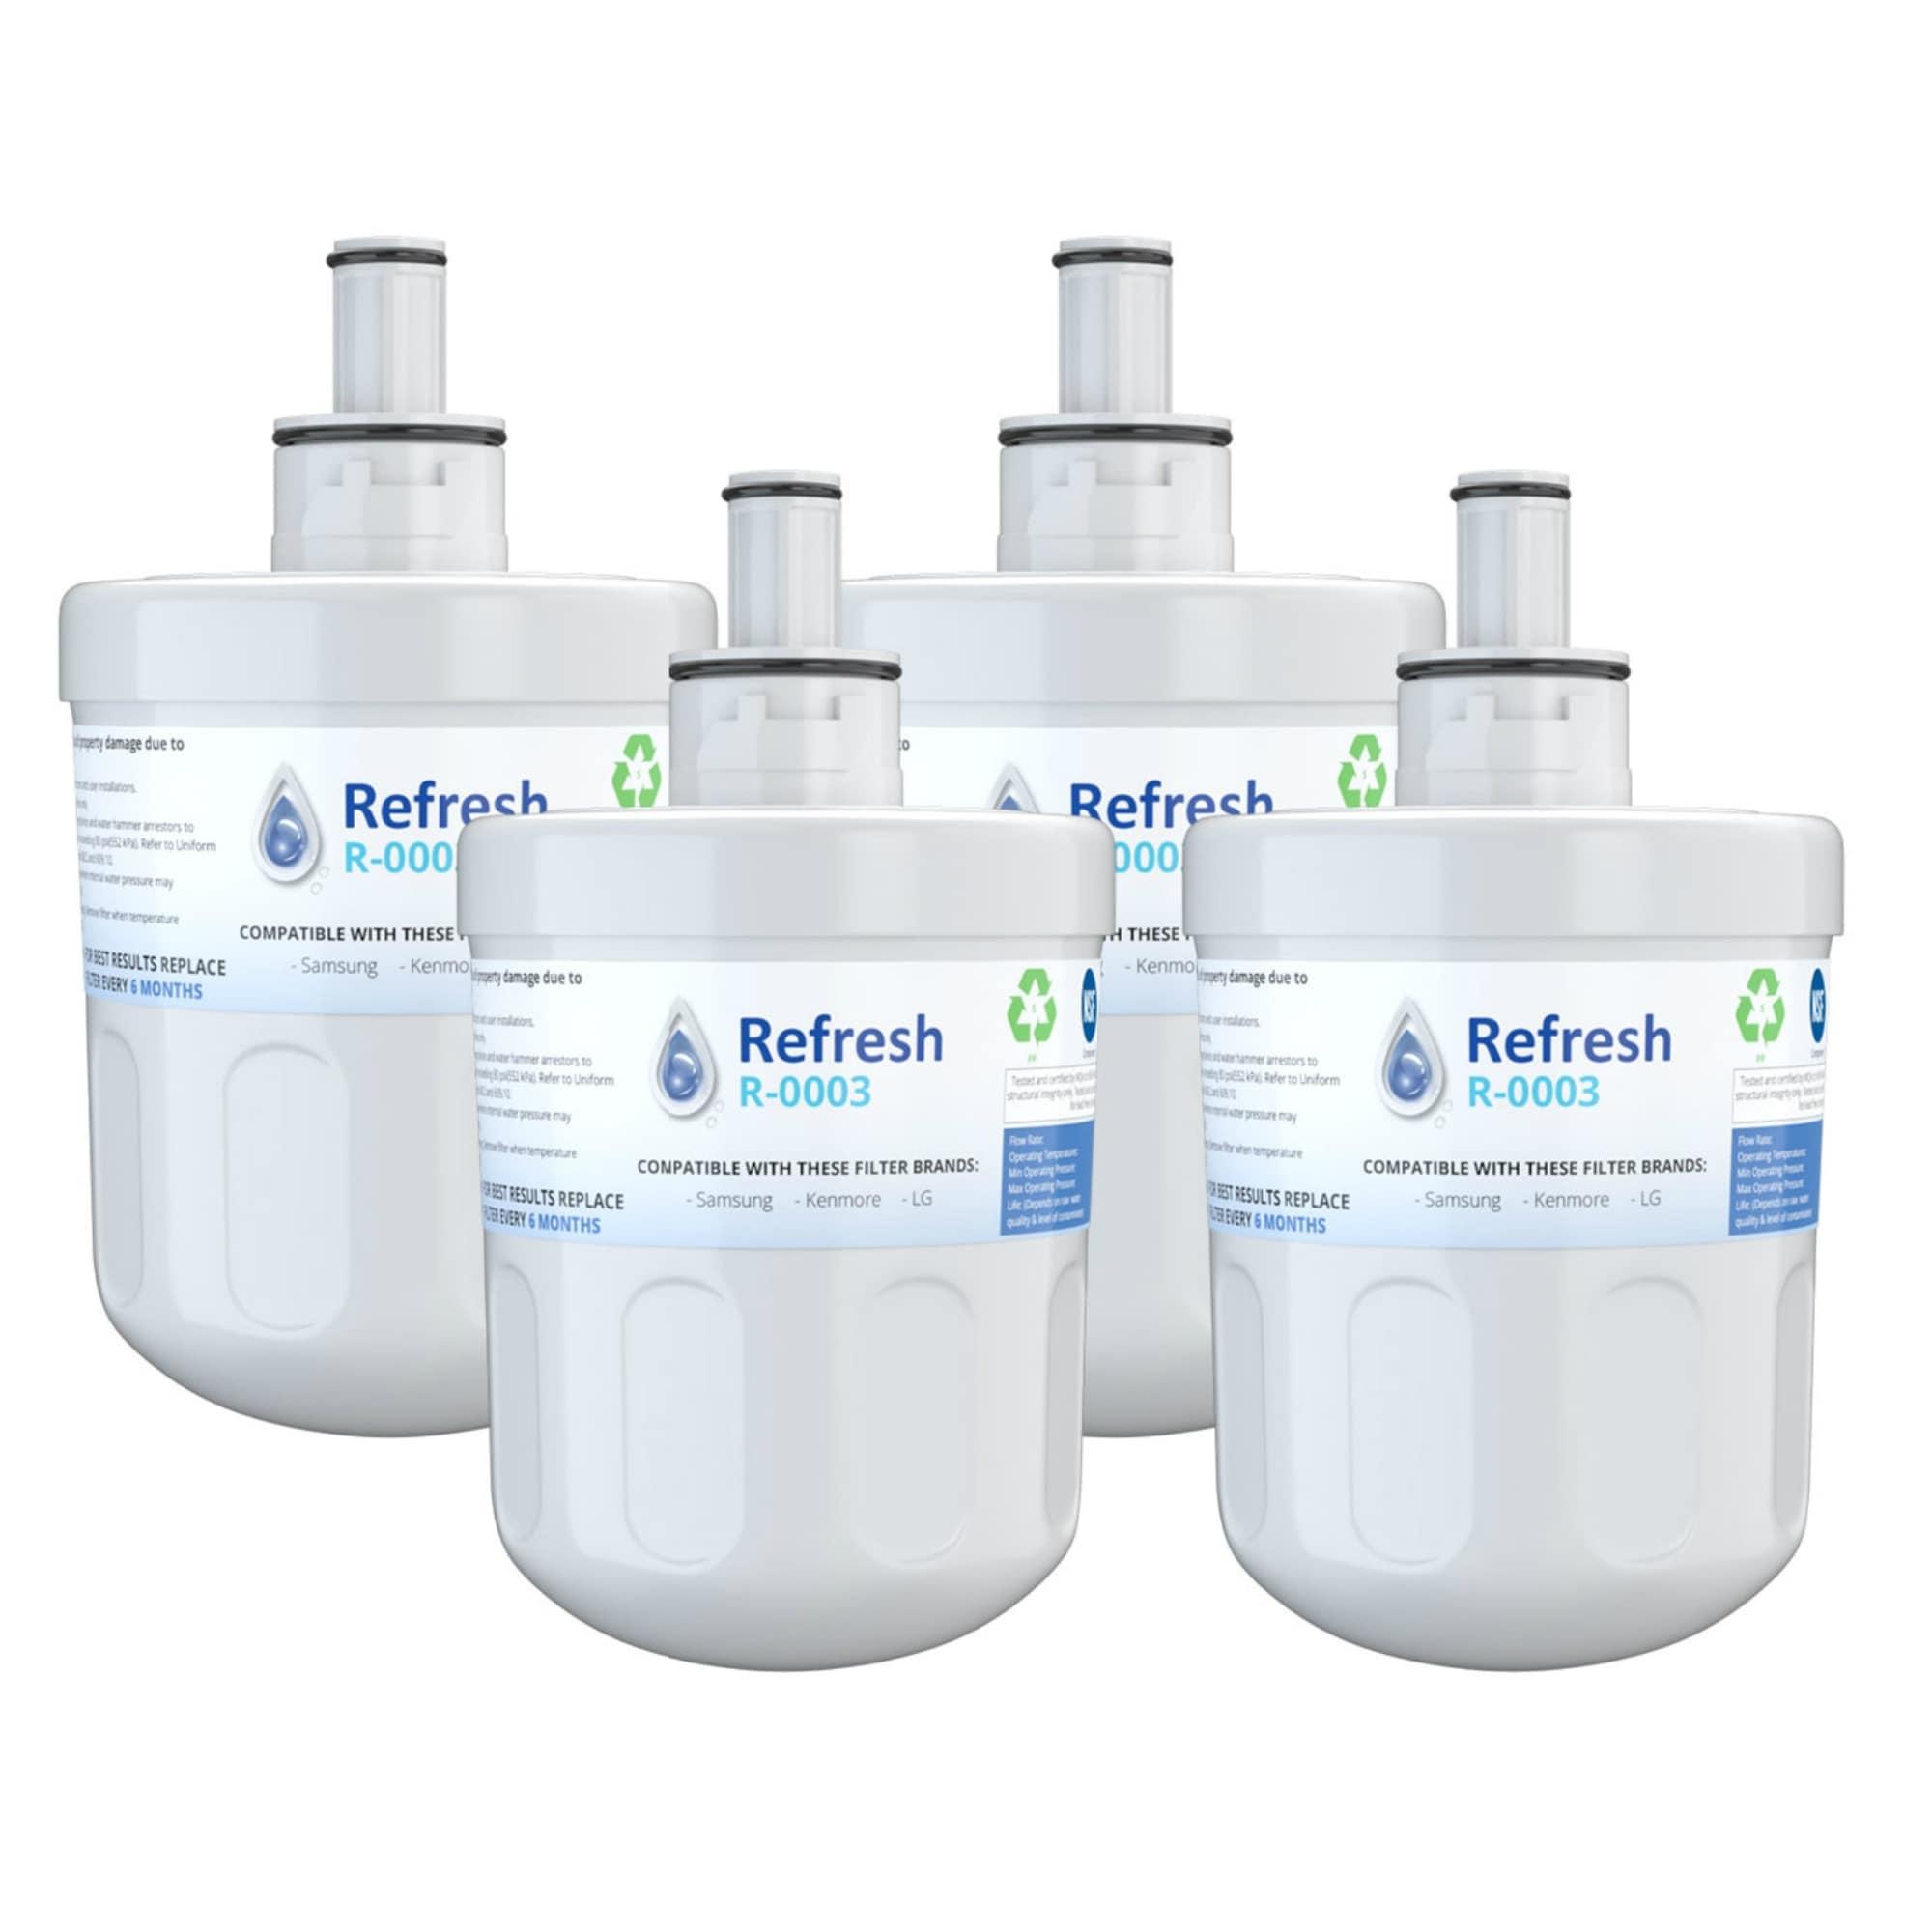 Refresh R-0003 Refrigerator Water Filter For Samsung DA29-00003G 4 Pack